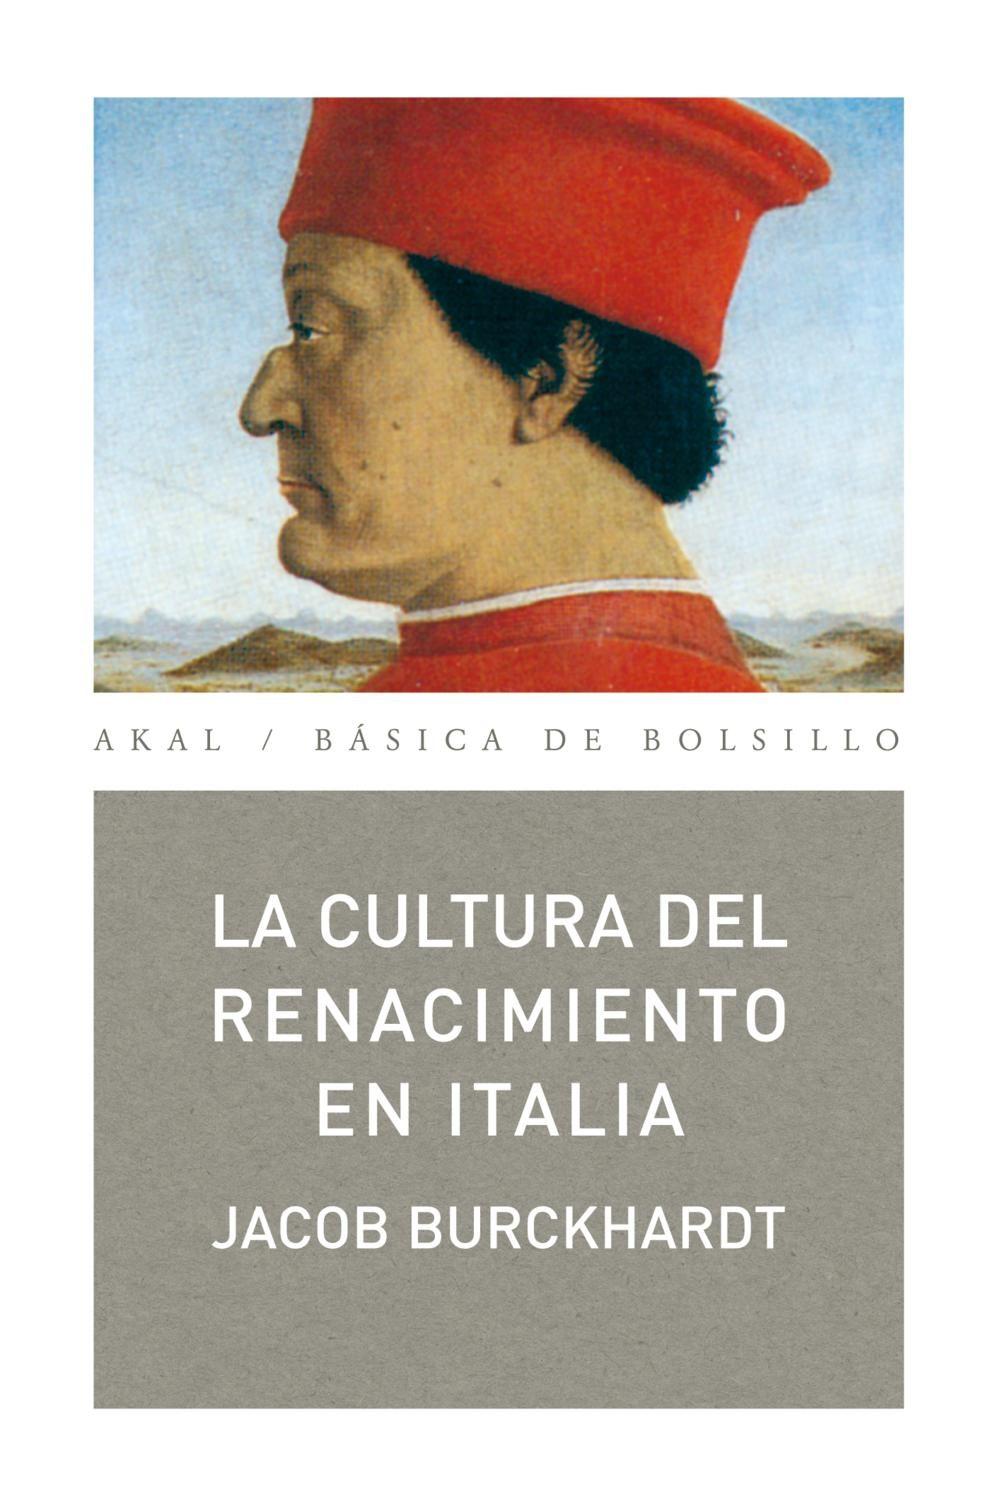 renacimiento-JacobBurckhardt.jpg